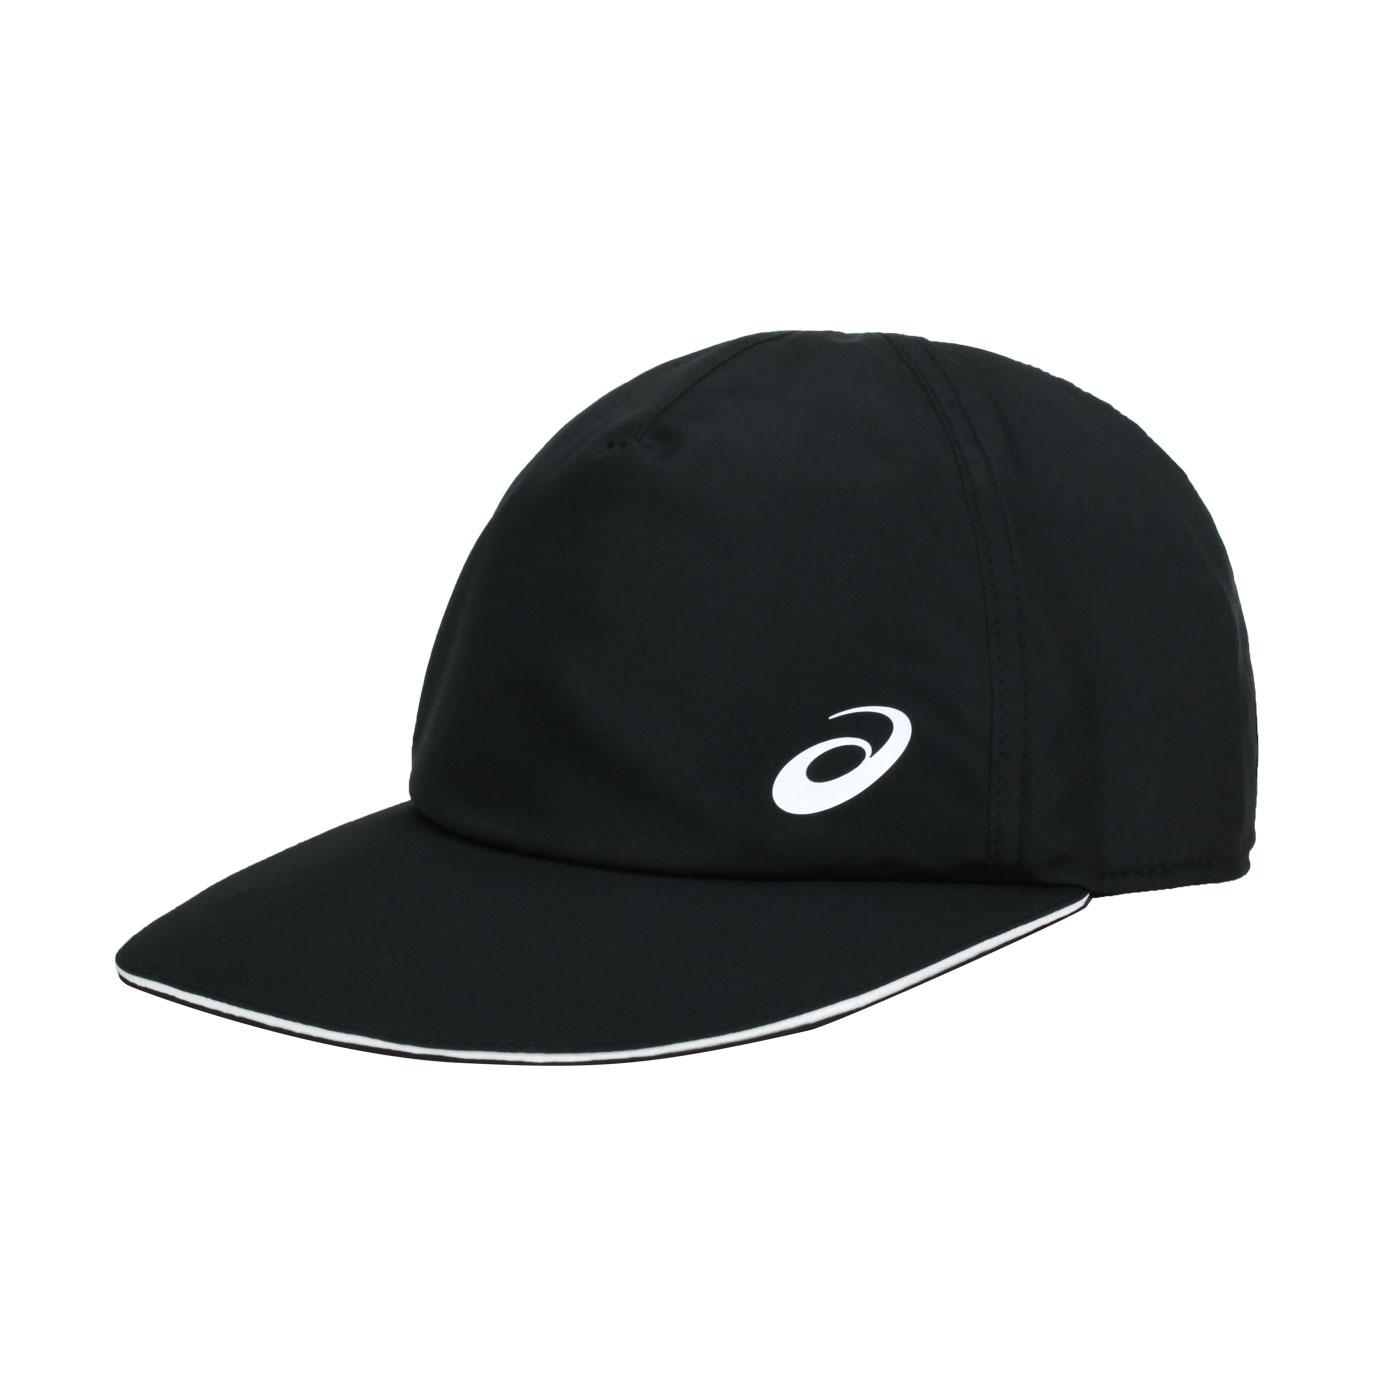 ASICS 平織帽 3043A048-002